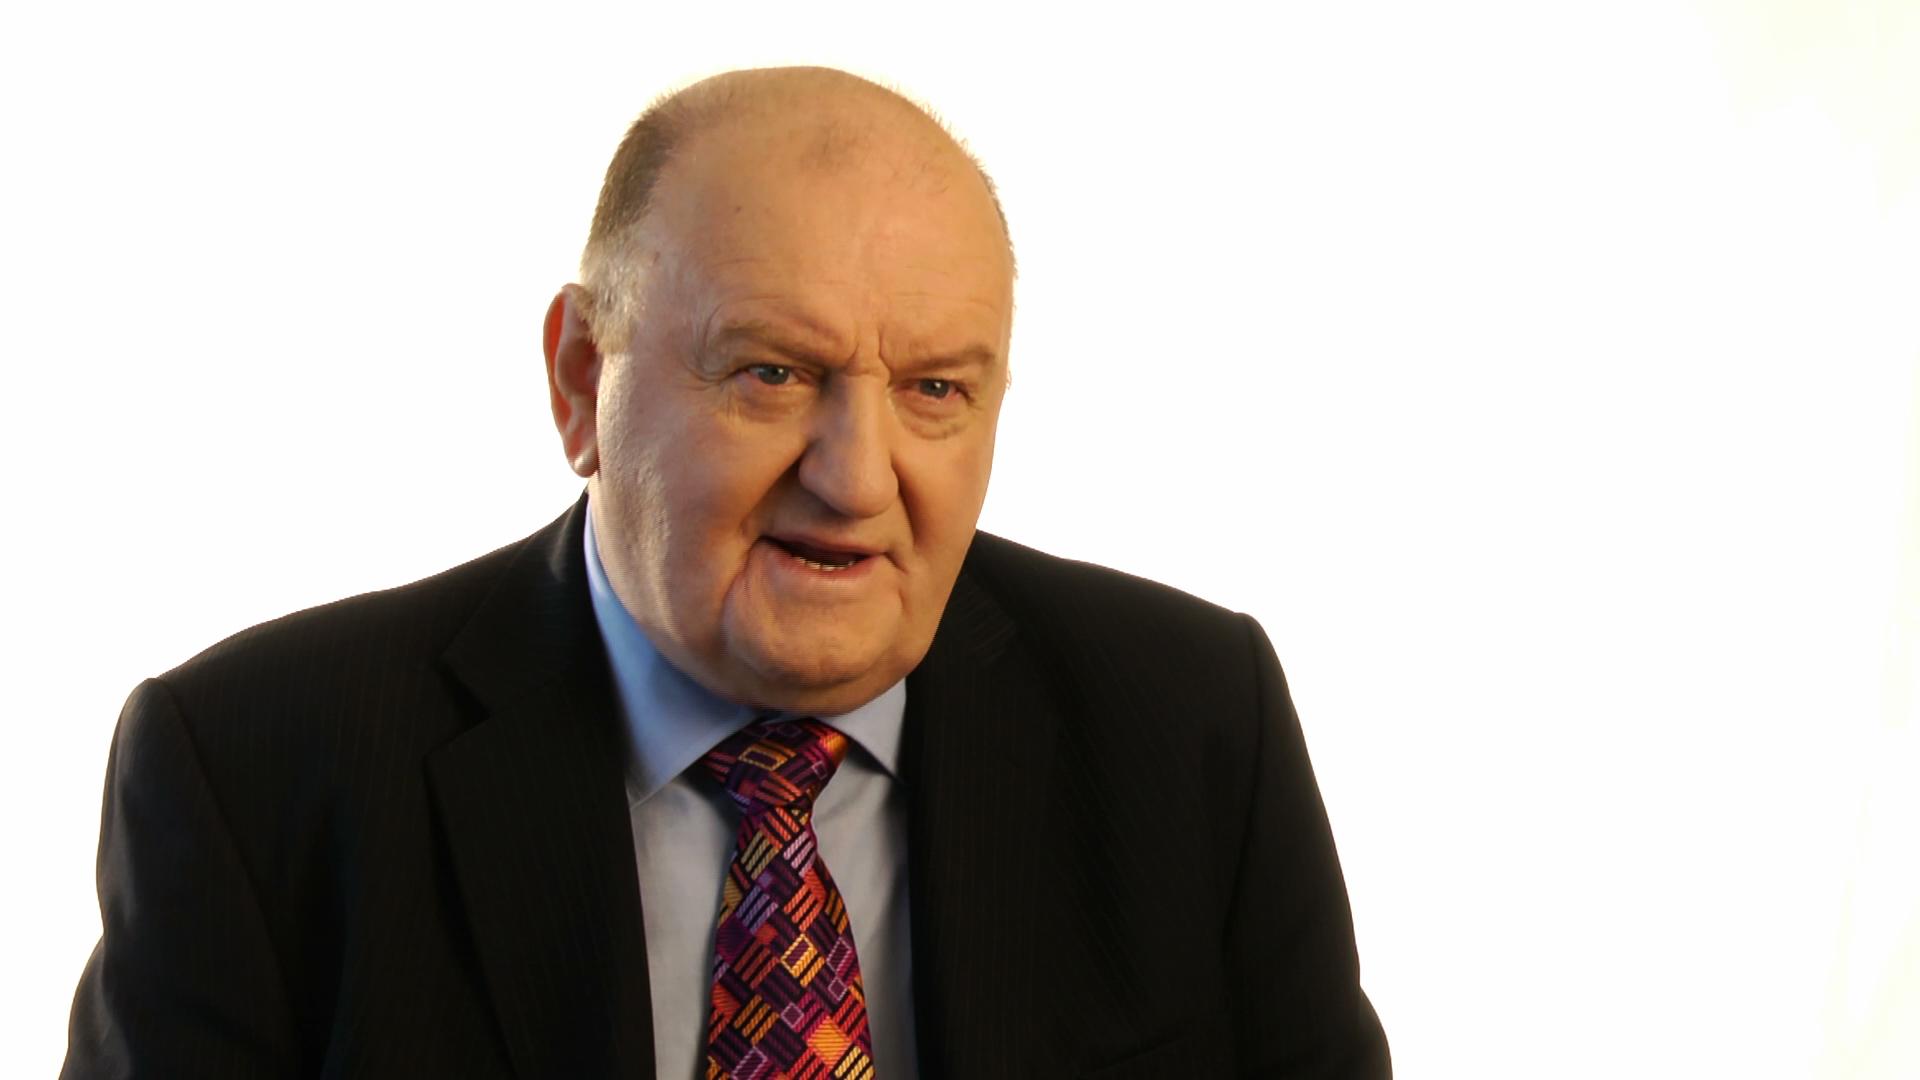 George-Hook-Way-To-Go-Death-Irish-Network-Ireland-Television-NITV-2.jpeg